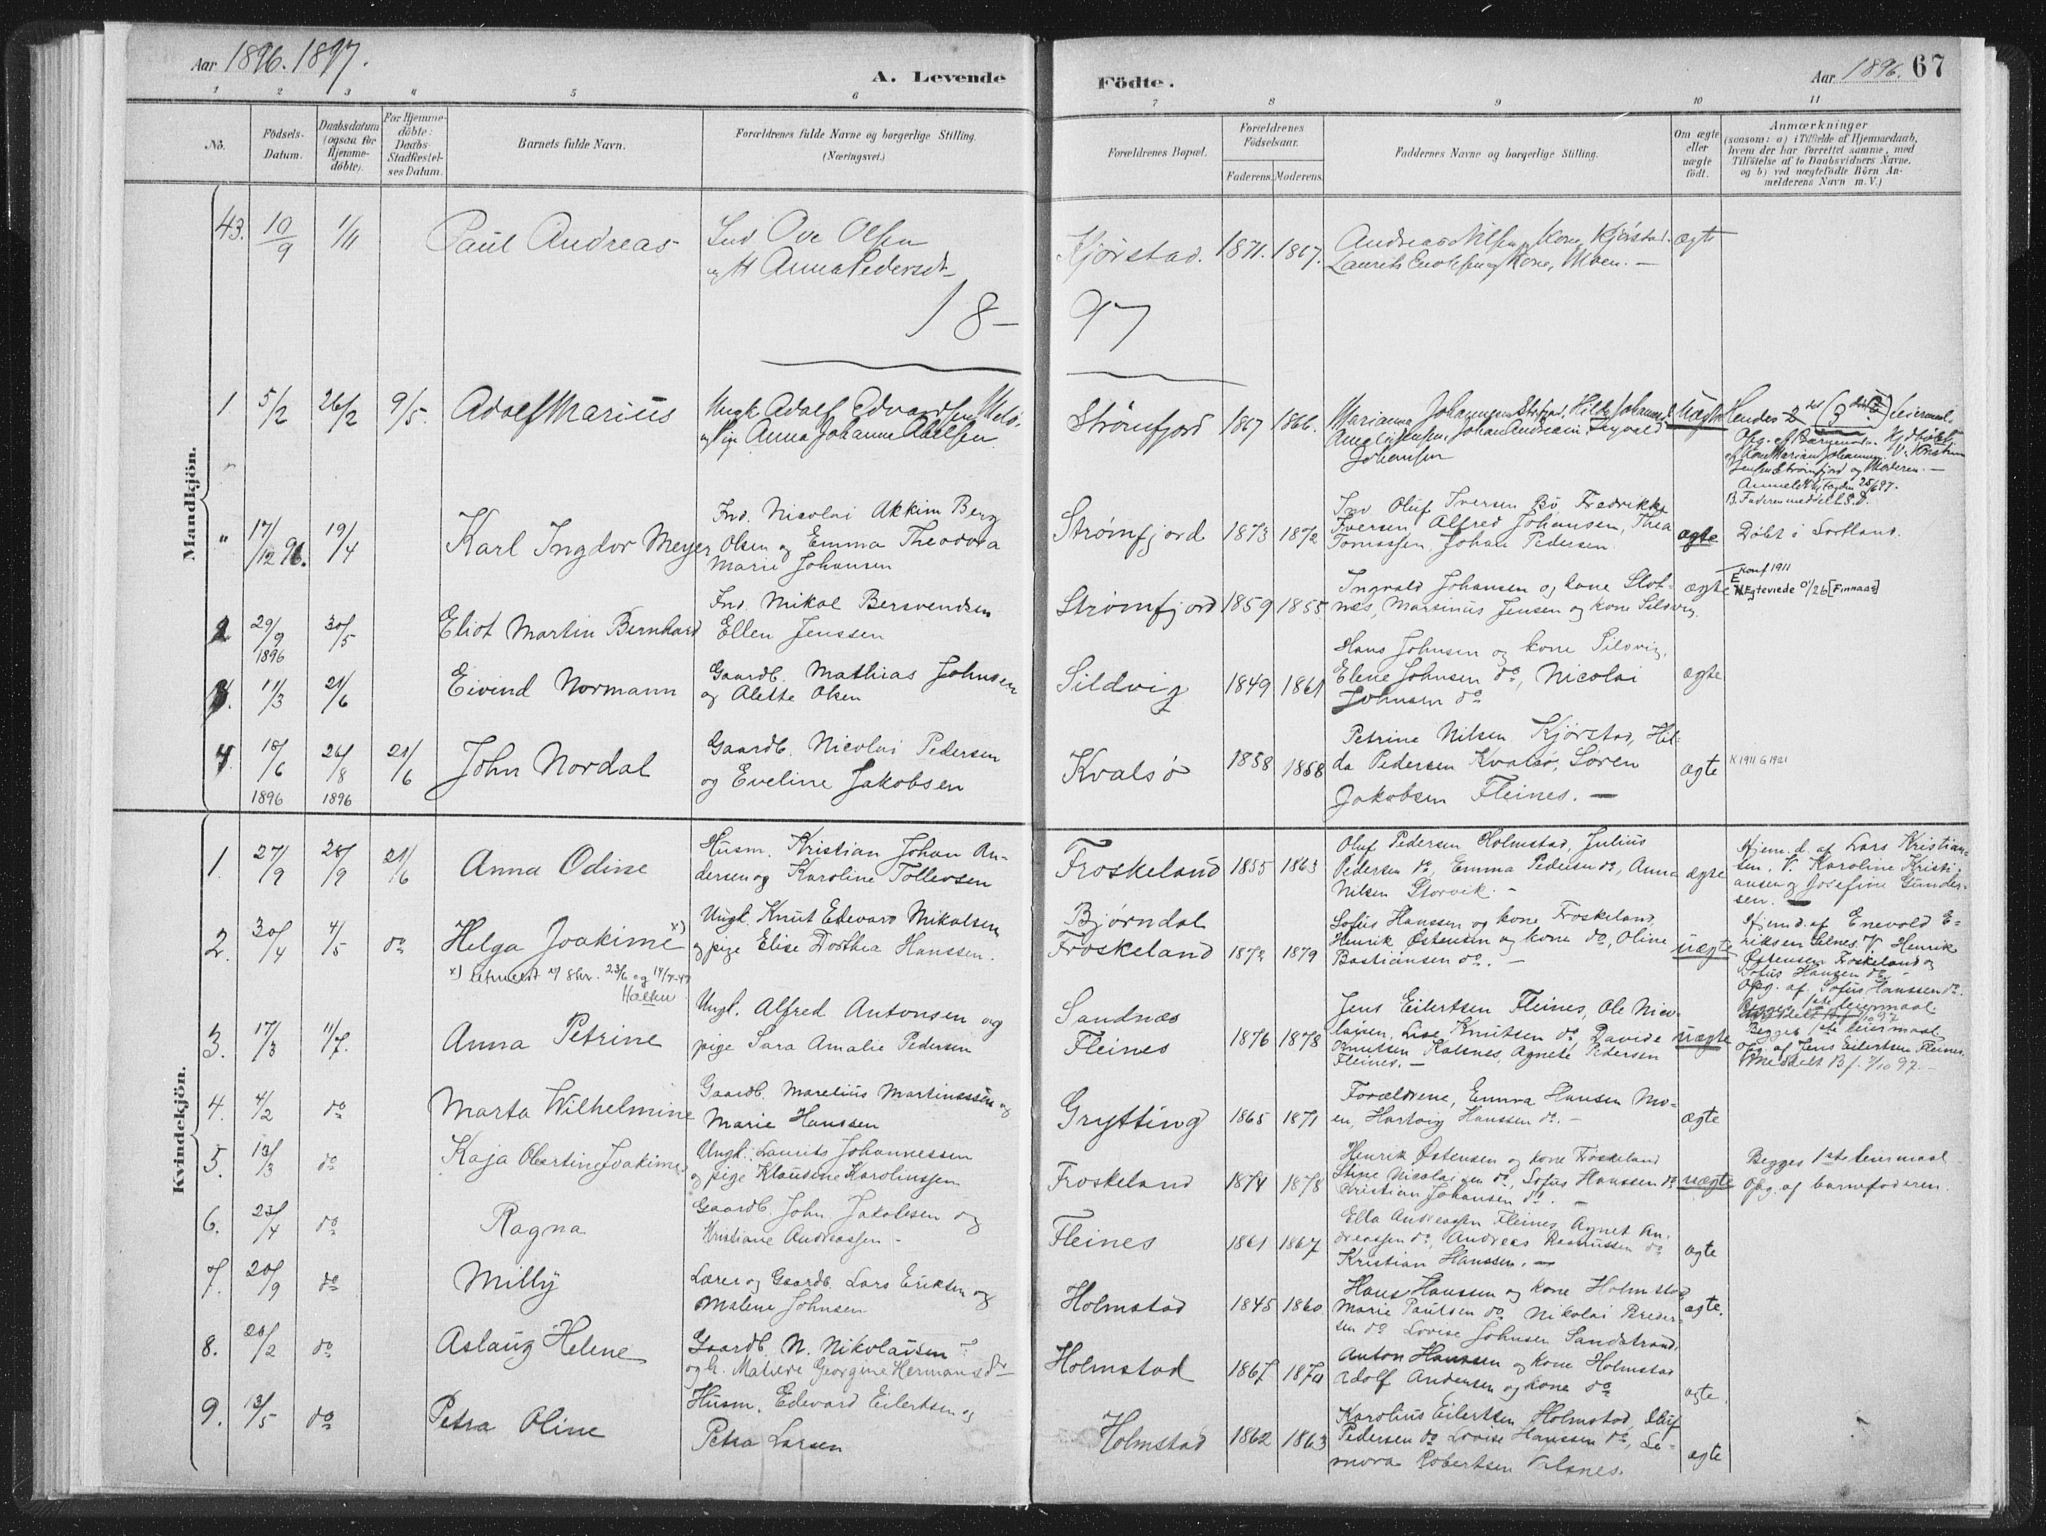 SAT, Ministerialprotokoller, klokkerbøker og fødselsregistre - Nordland, 890/L1286: Ministerialbok nr. 890A01, 1882-1902, s. 67